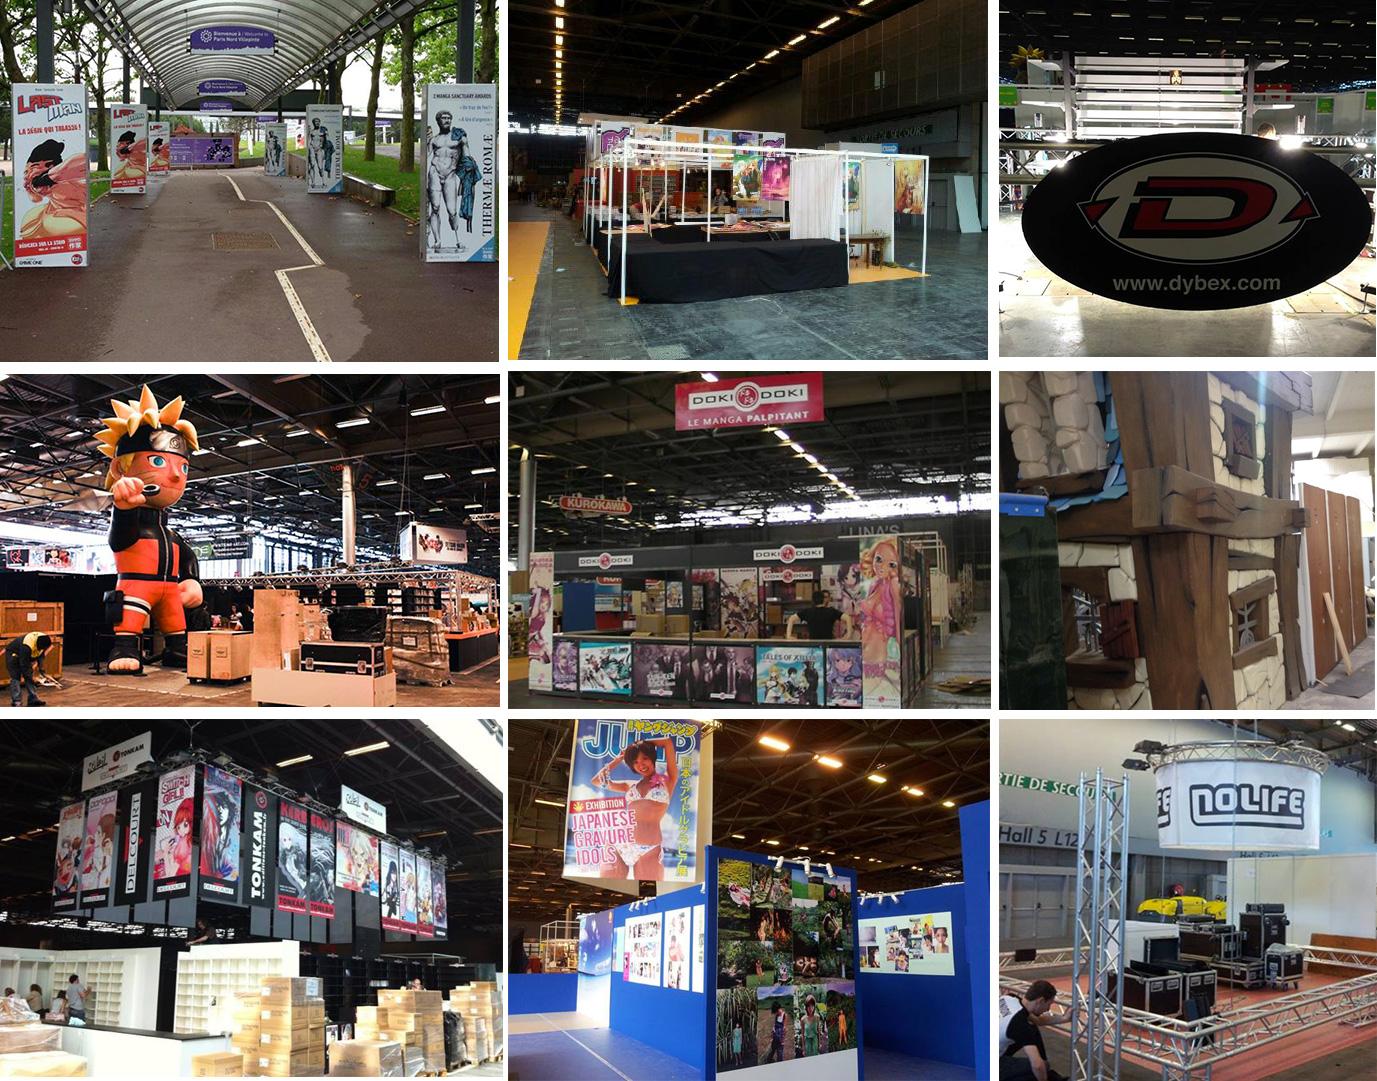 Japan expo 2013 j 1 le montage des stands manga news for Montage des stands